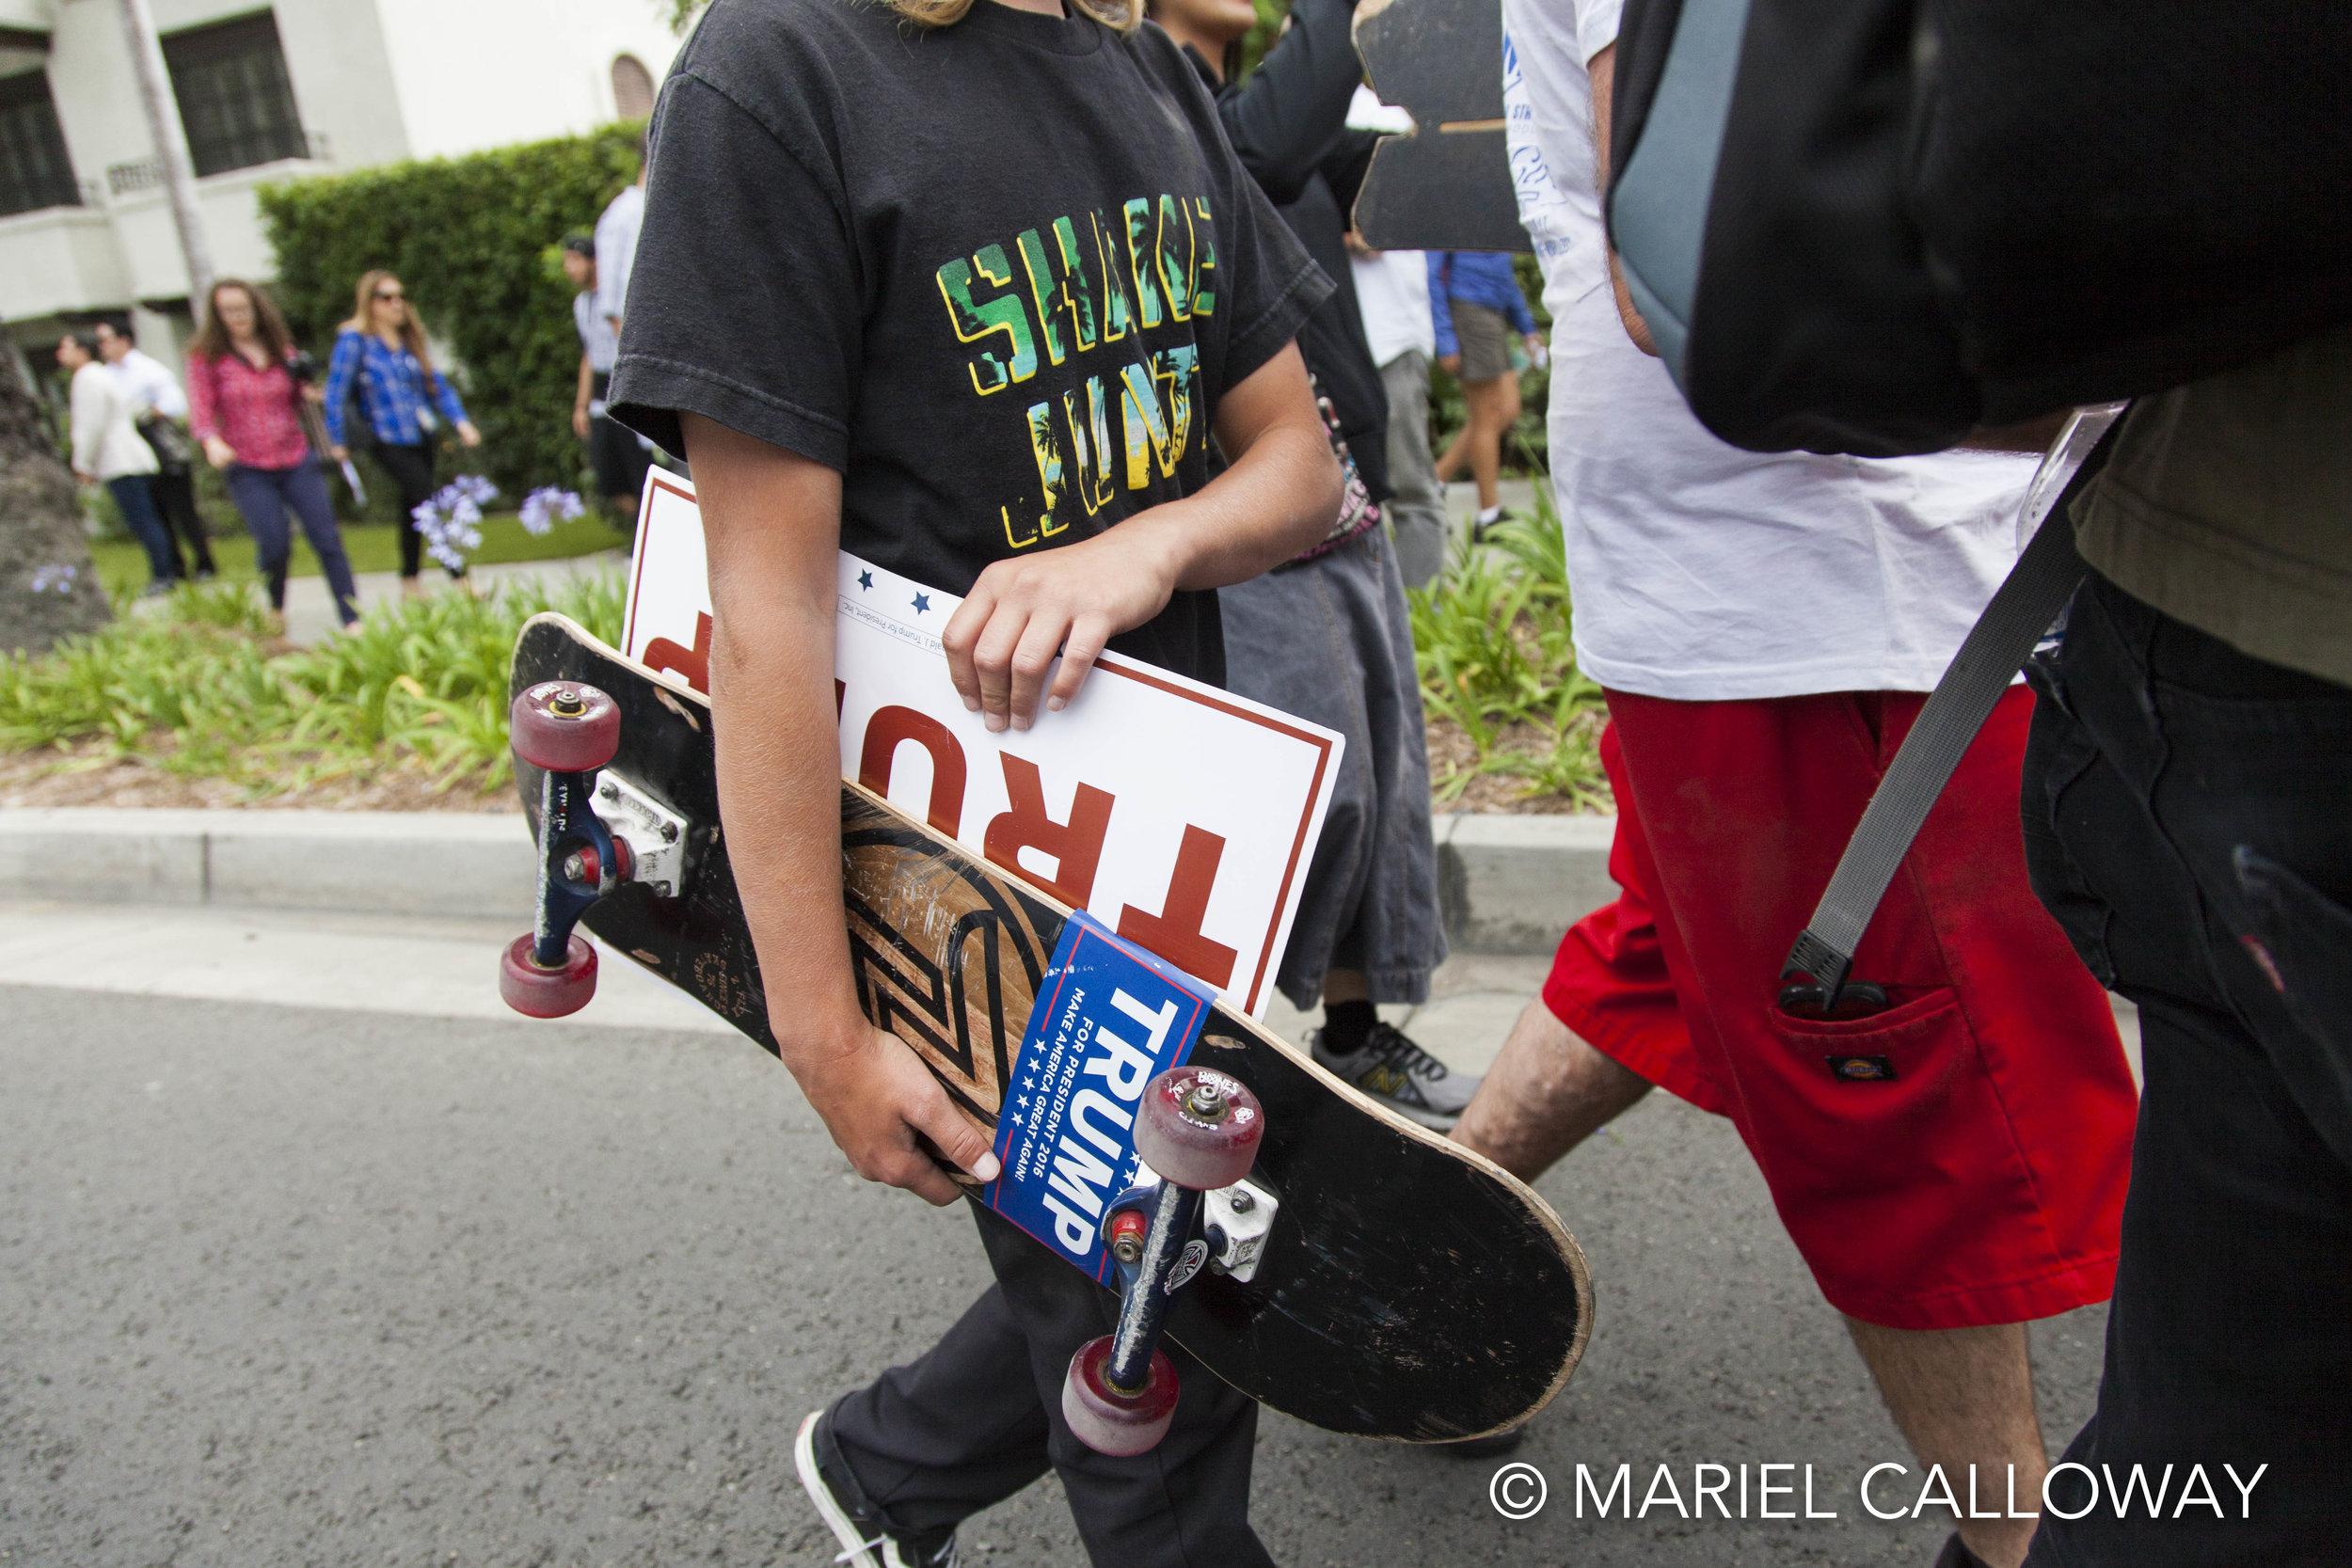 35_Mariel-Calloway-Donald-Trump-Anaheim-24.jpg